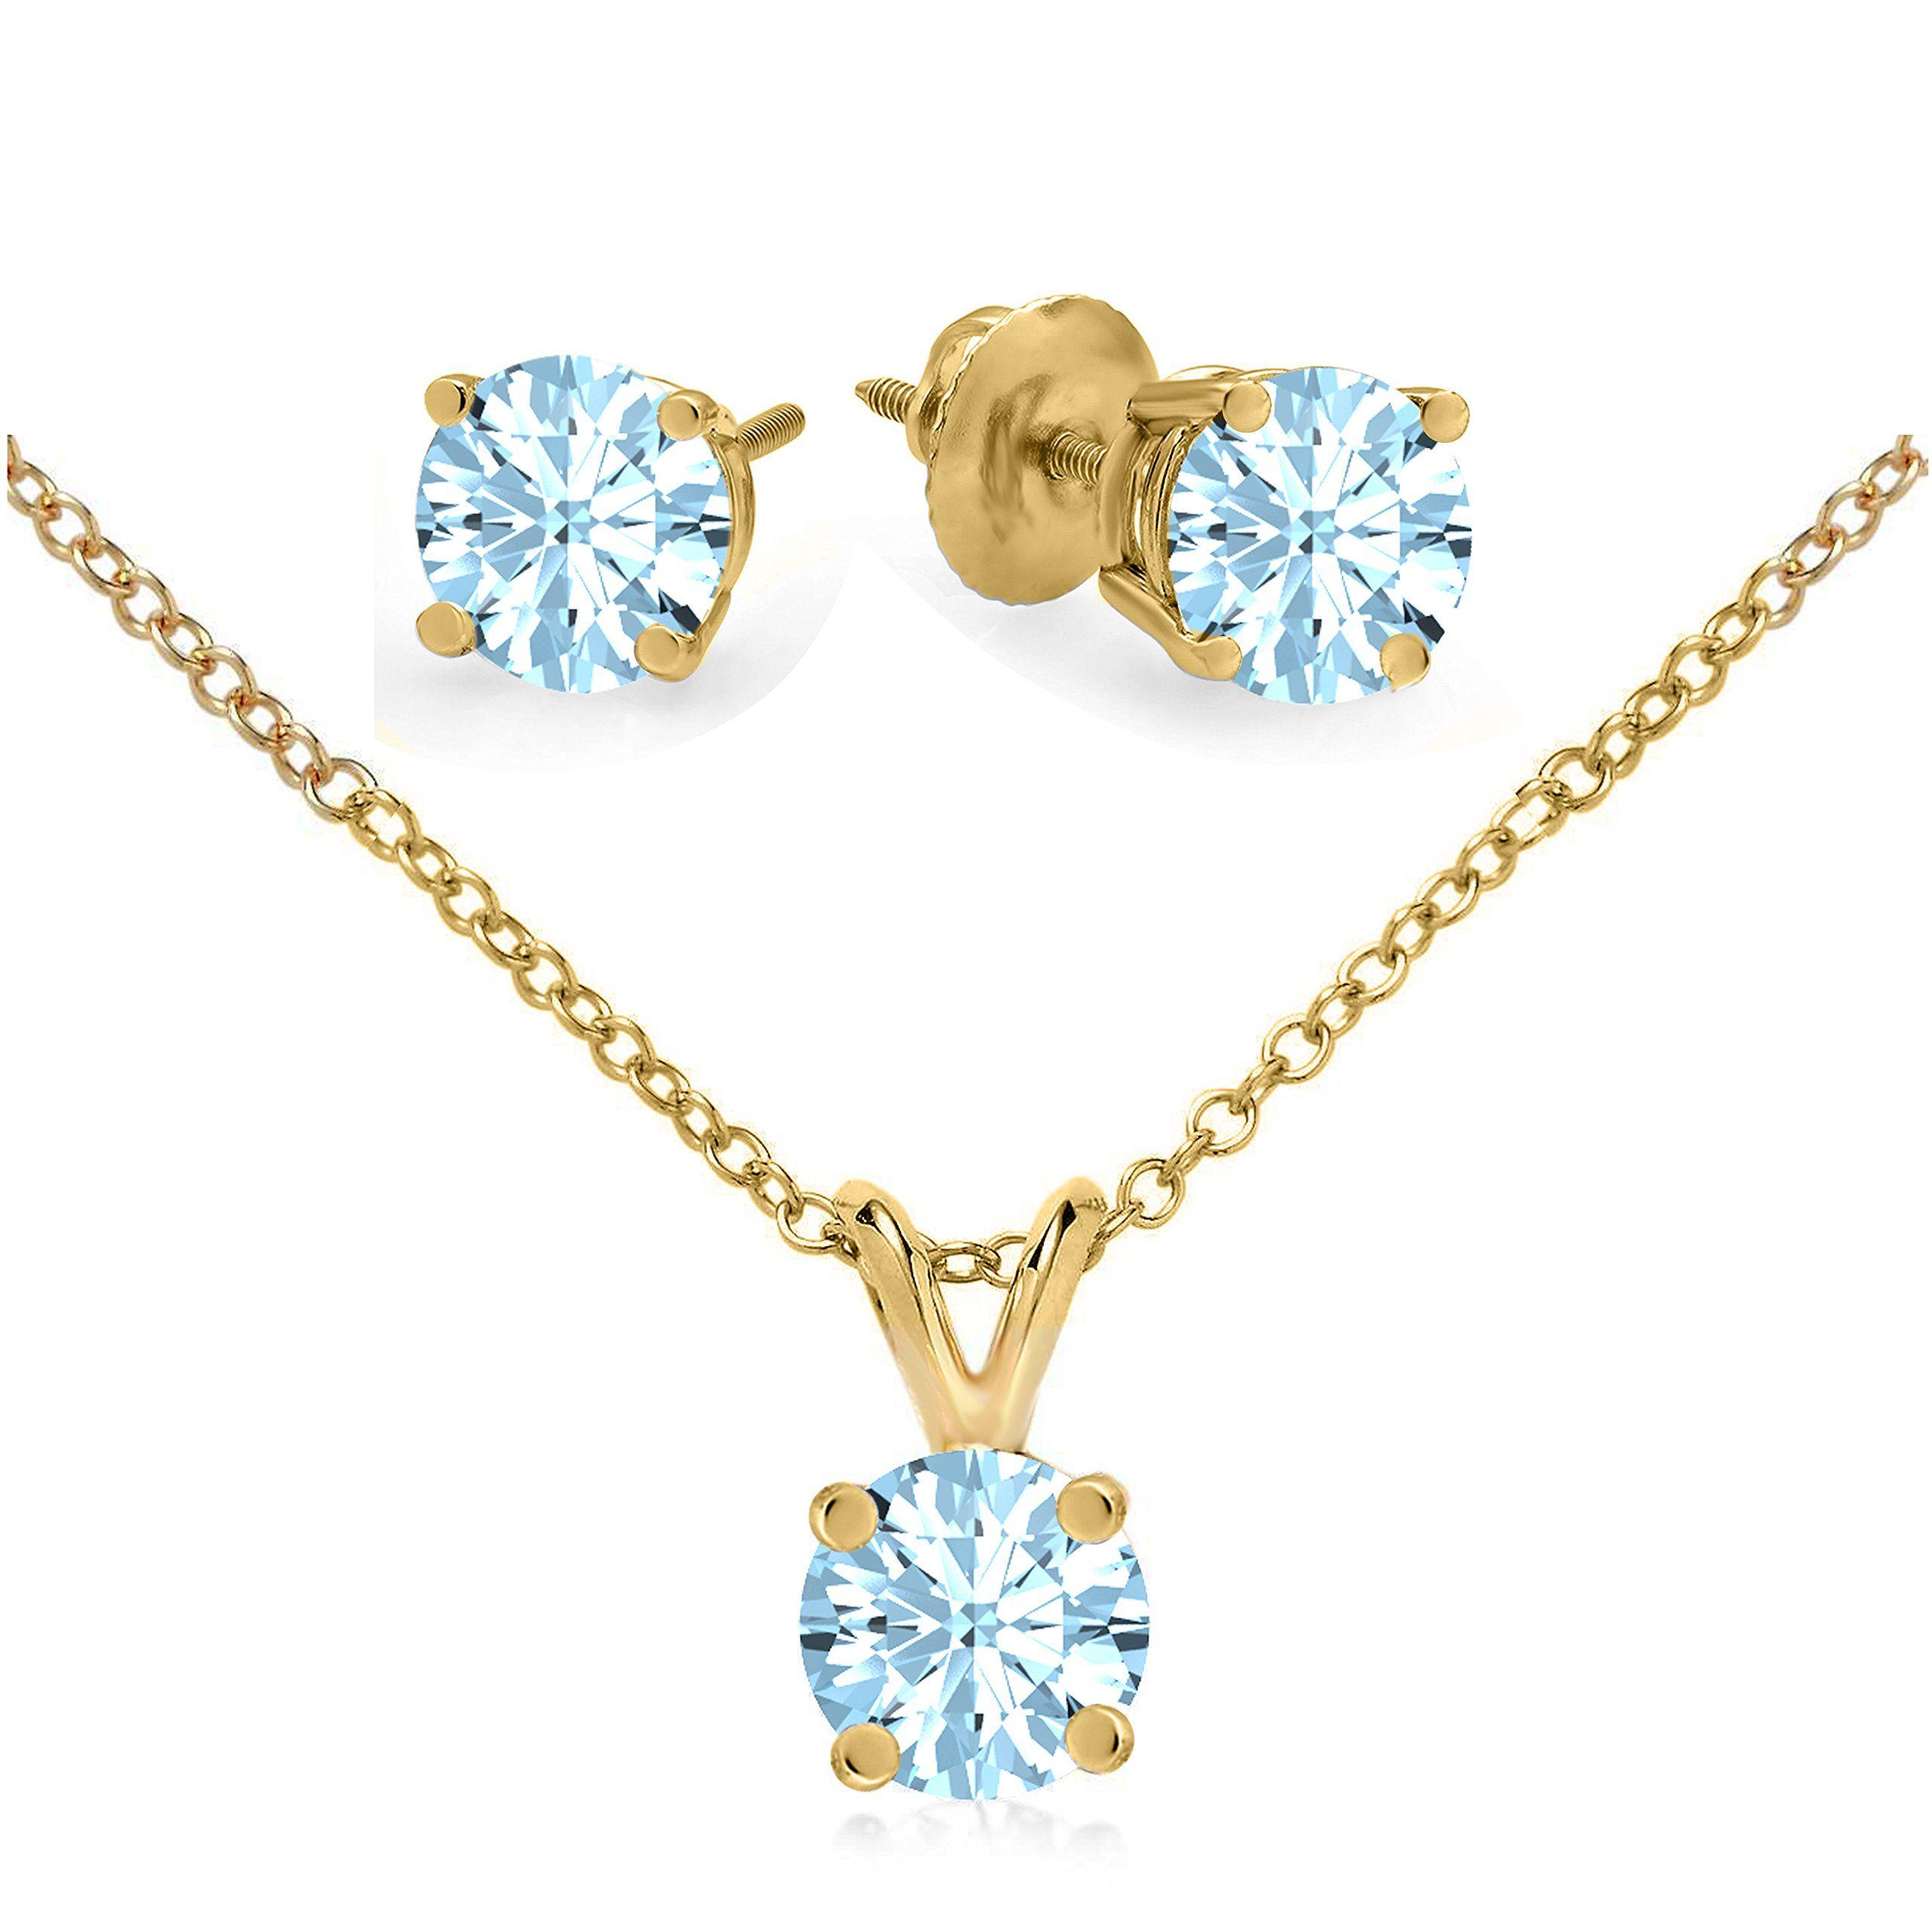 Pretty jewellery aquamarine pendant u earrings necklace set in k